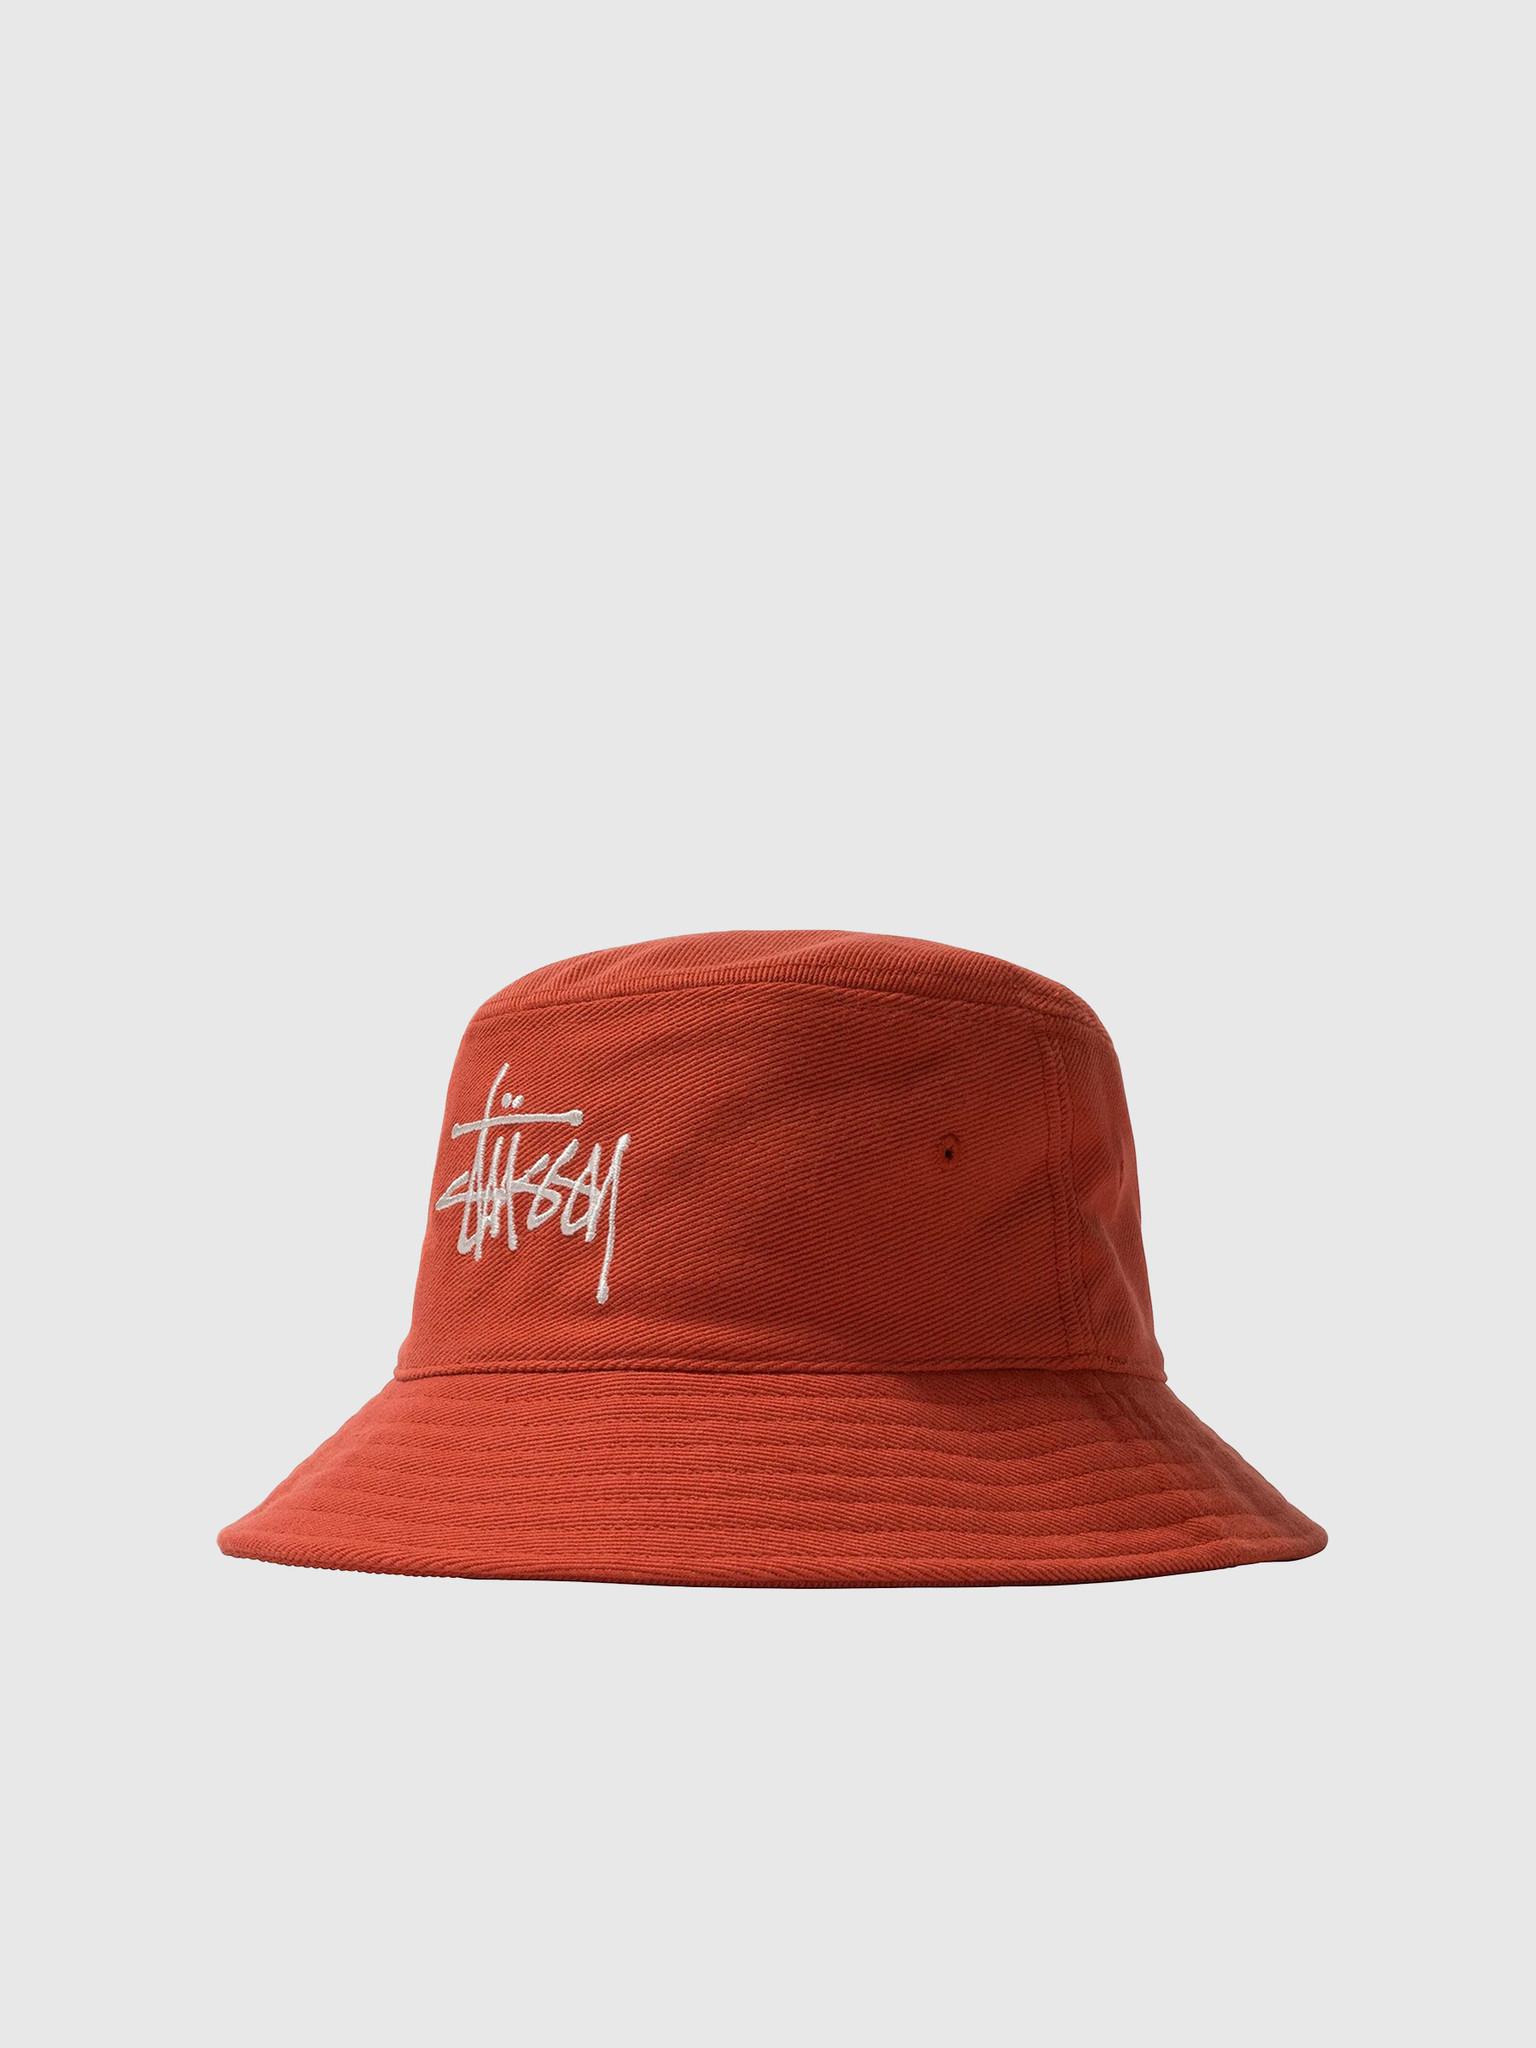 Stussy Stussy Big Logo Twill Bucket Hat Orange 1321024-0602